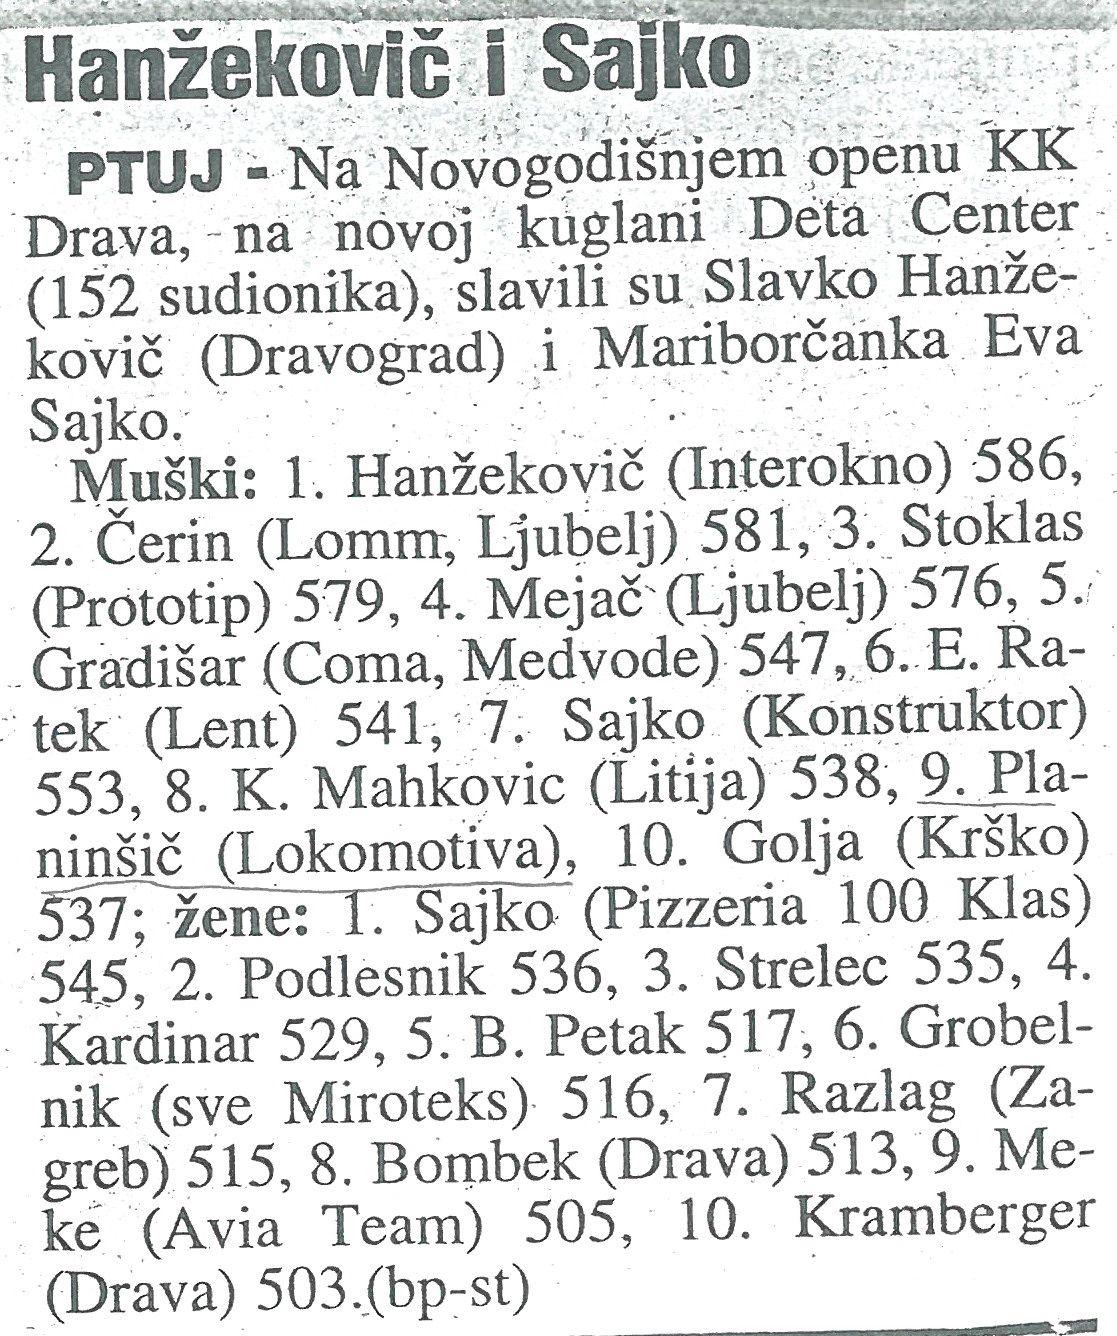 Sportske Novosti, 2006